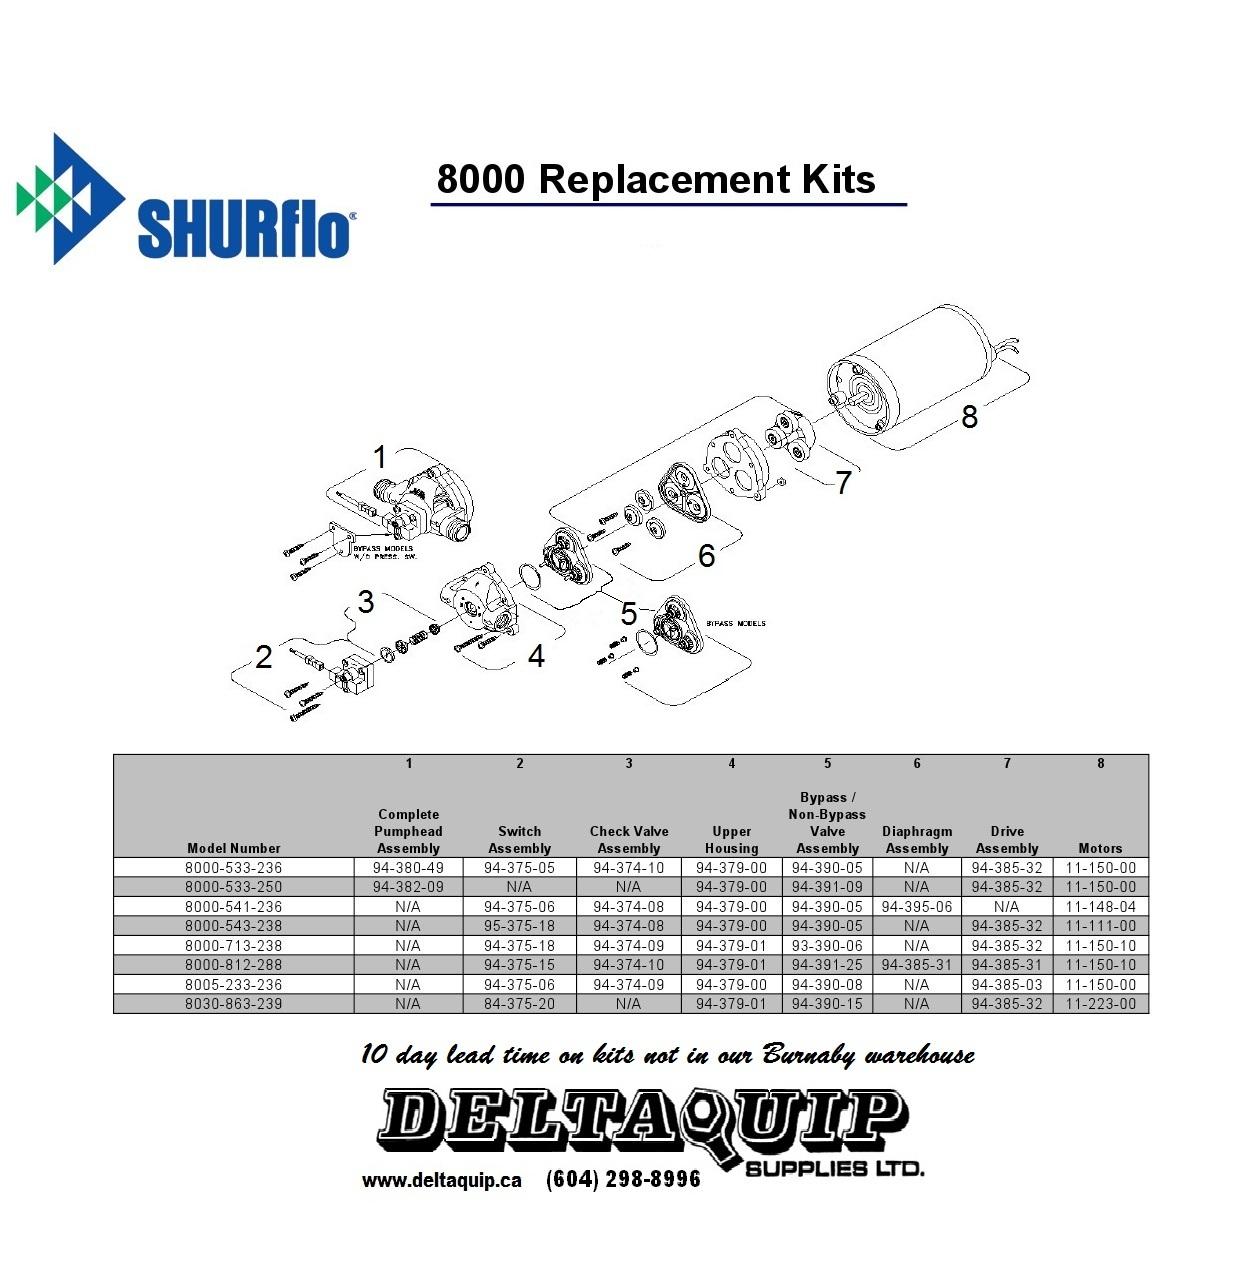 Shurflo Series Pumps Deltaquip Supplies Ltd